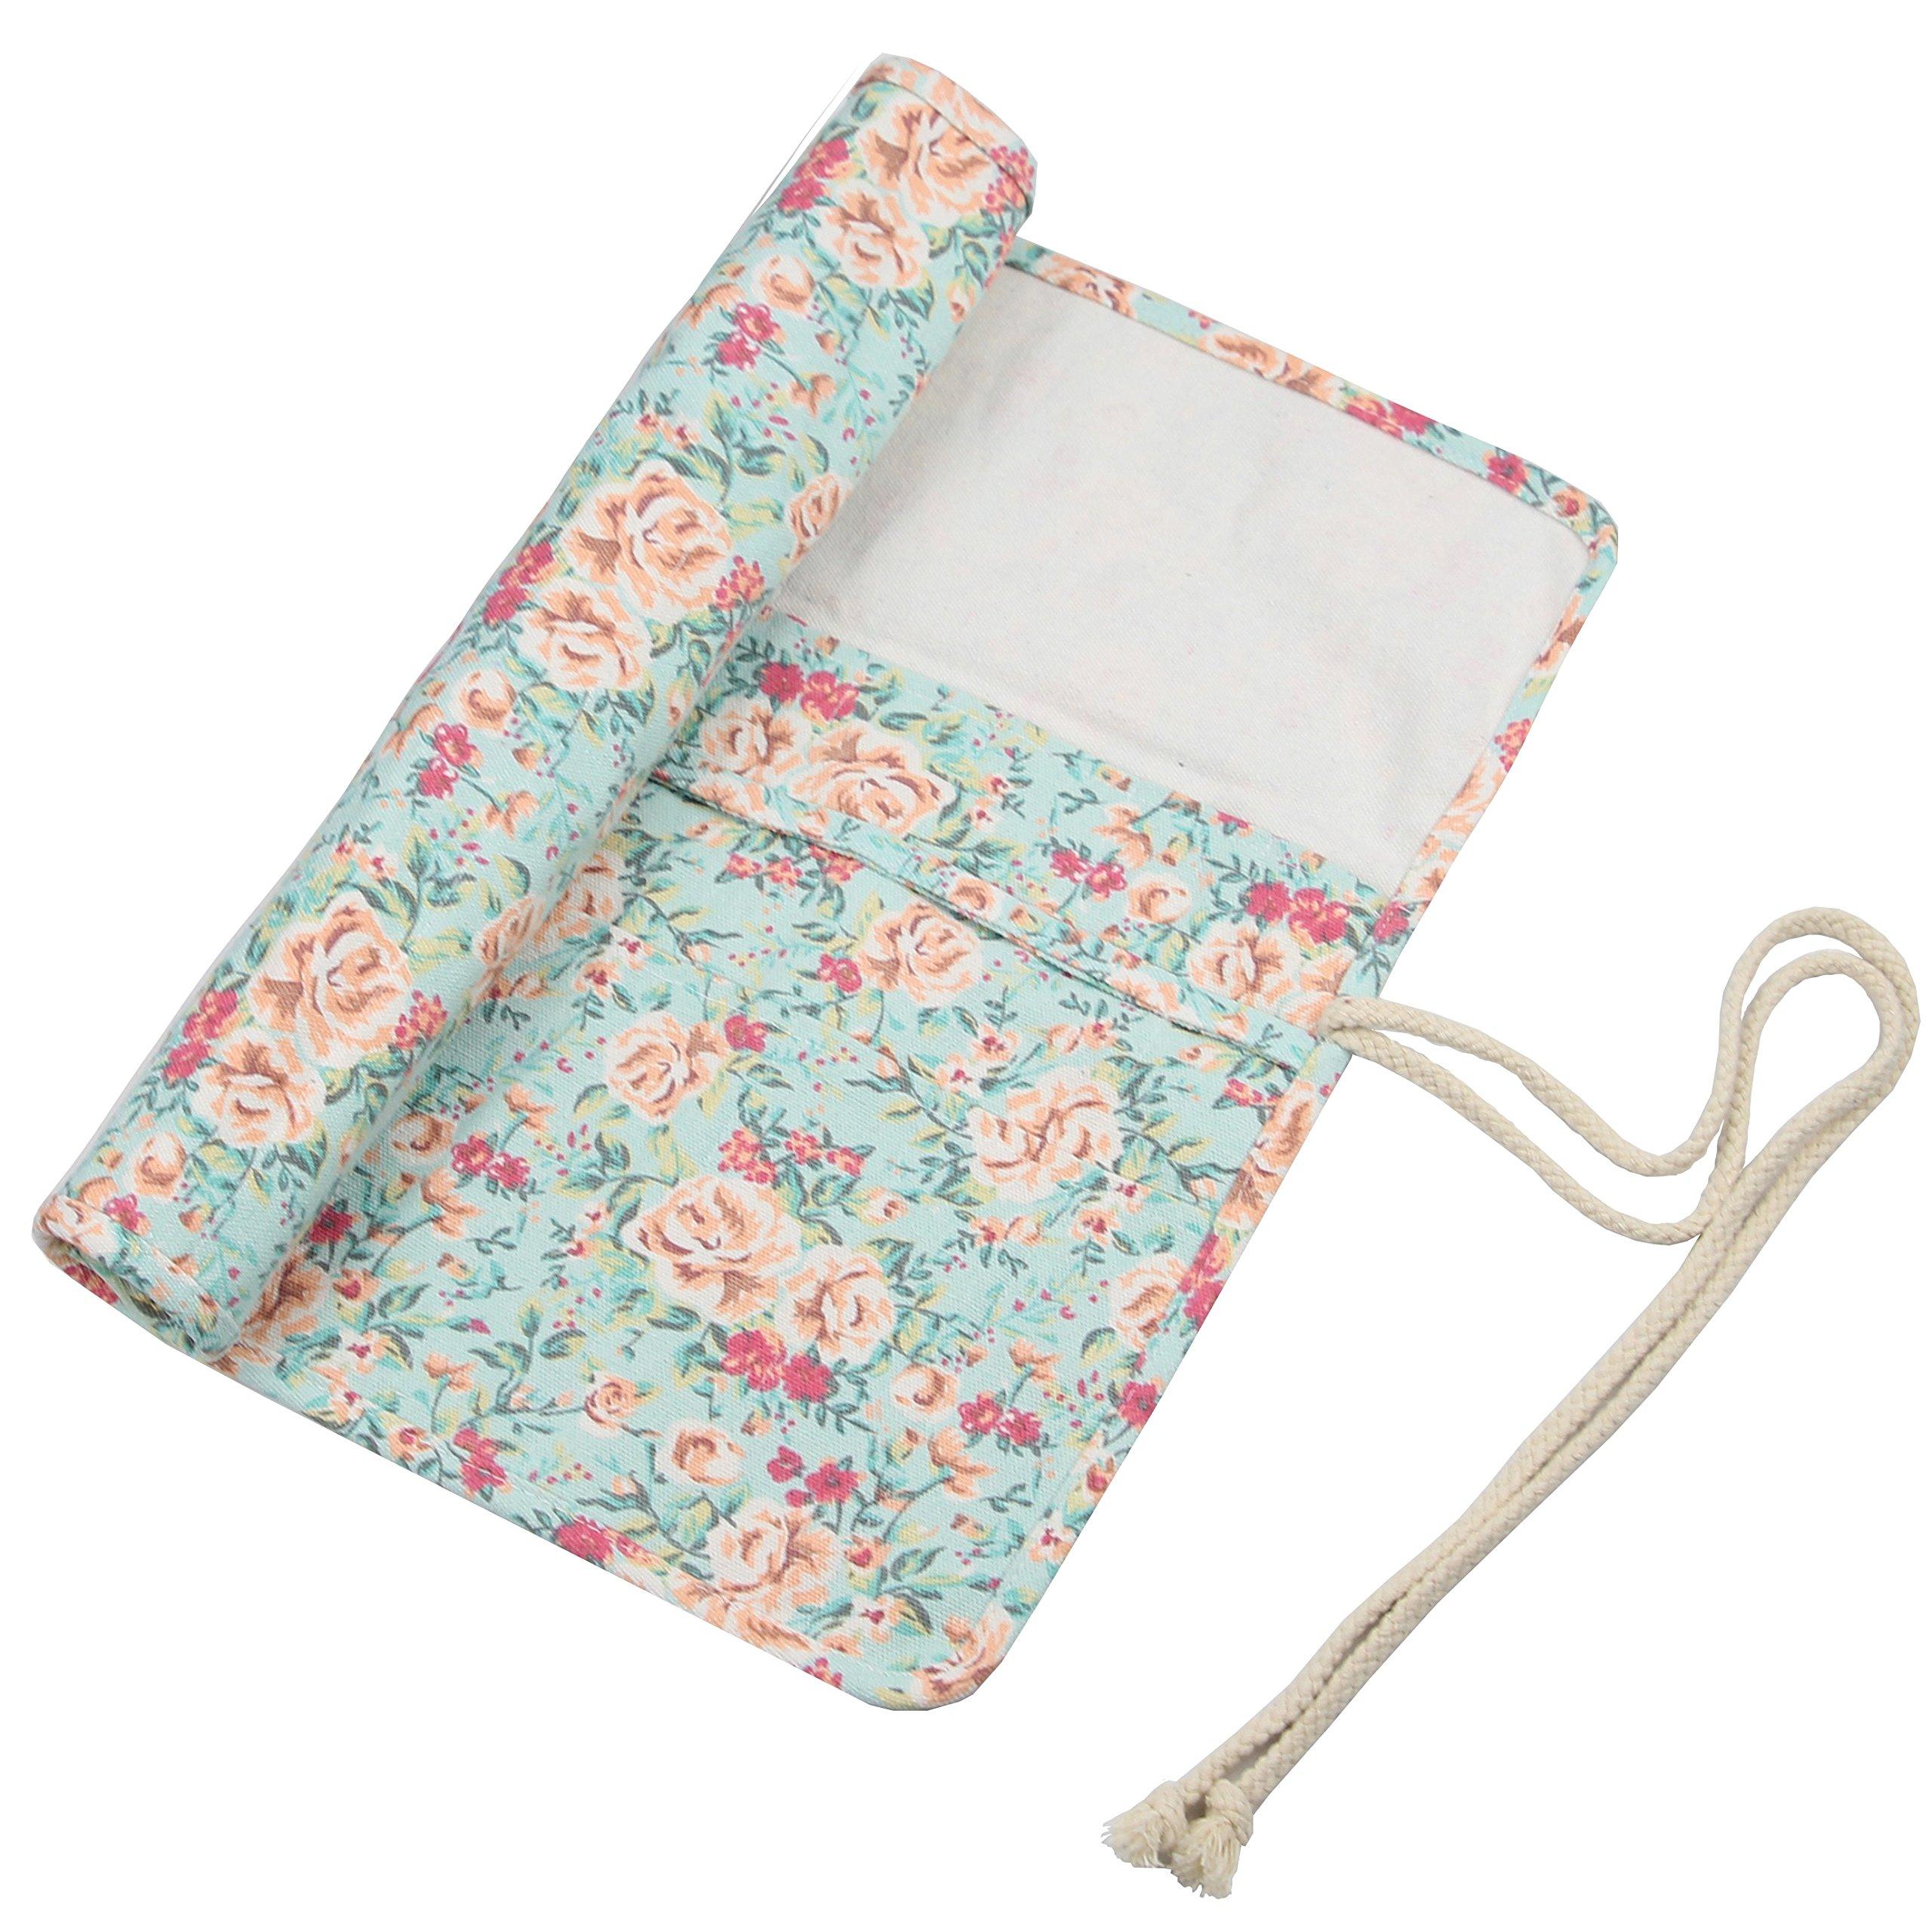 20 Pockets Art Paint Brushes Case Roll up Pen